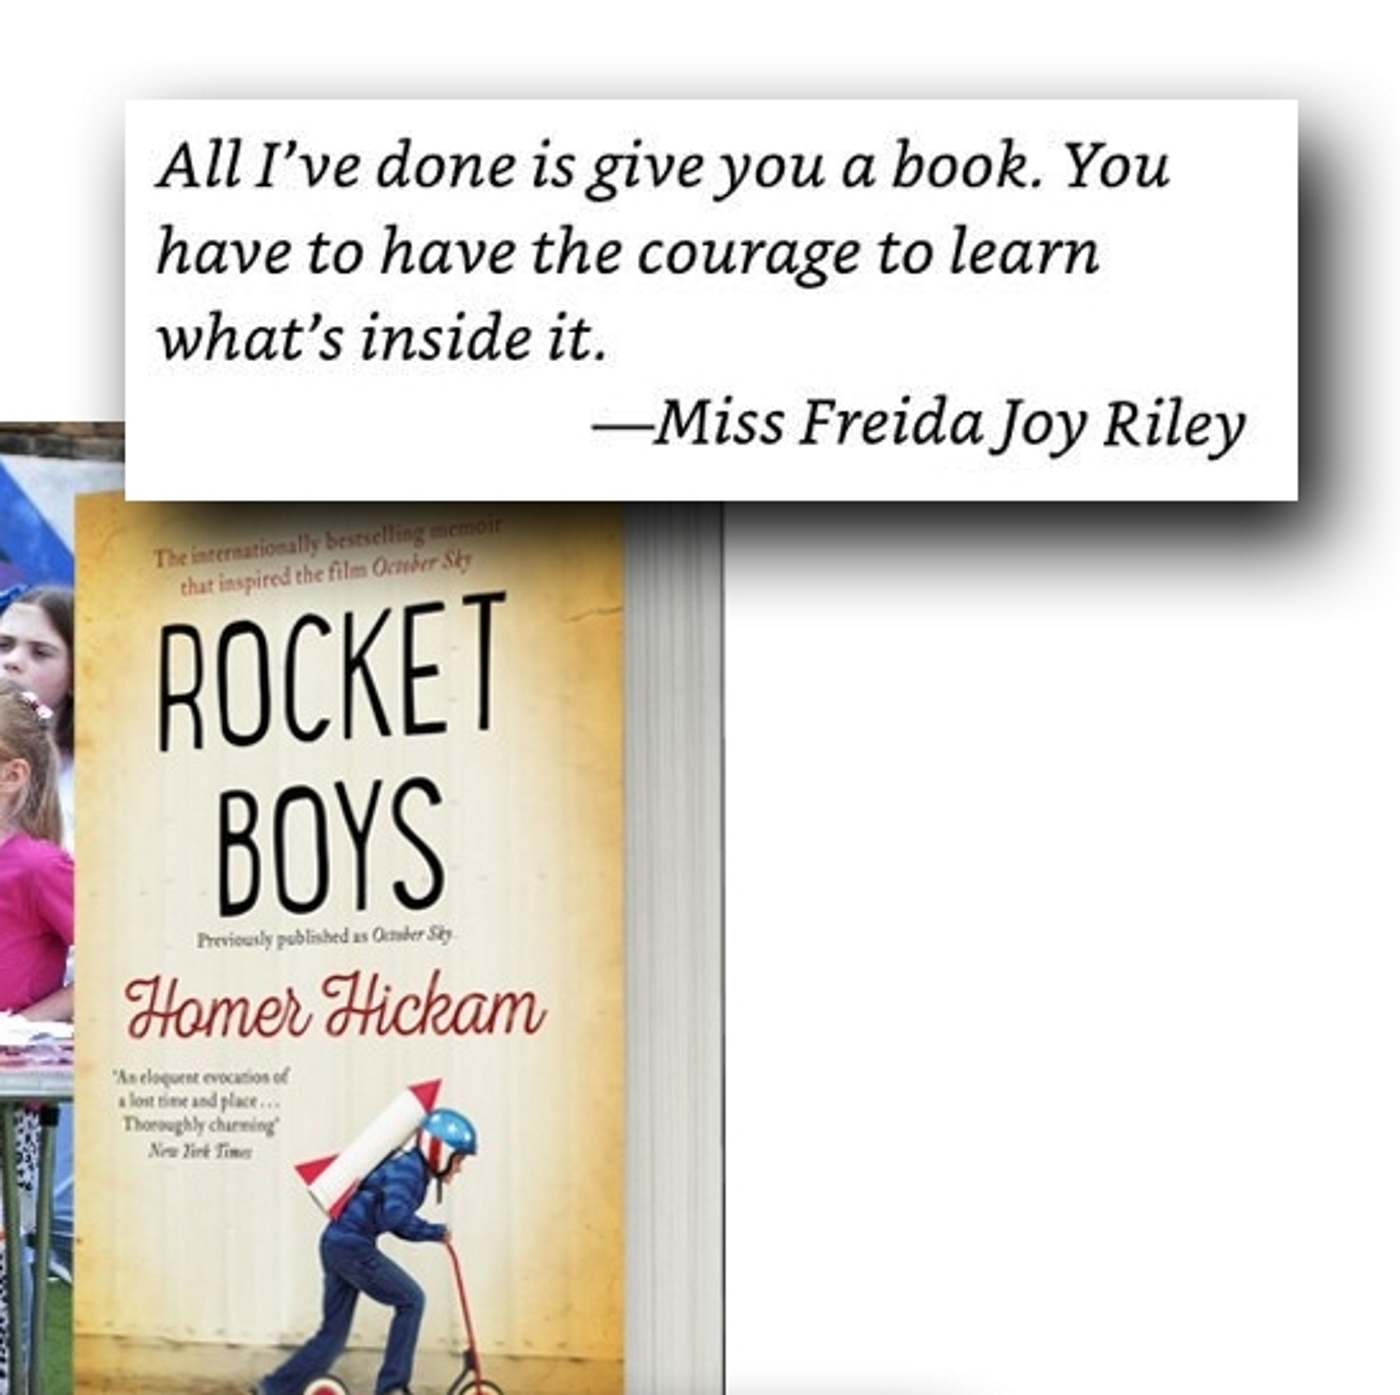 Rocket Boys book comp 1.jpg